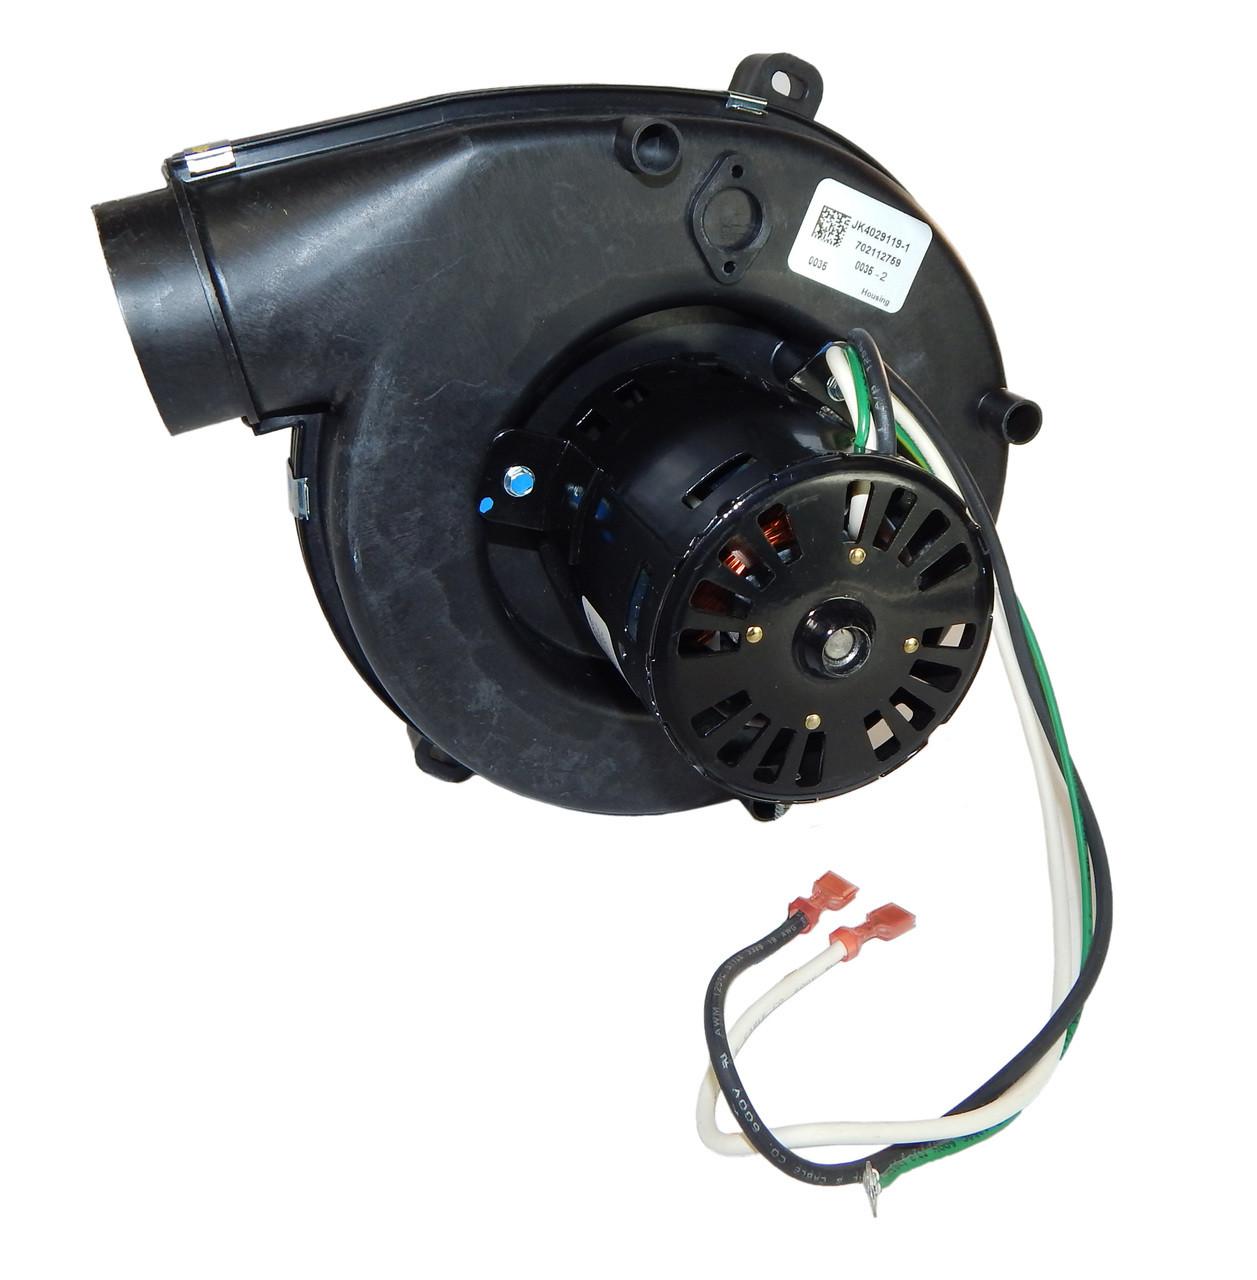 Fasco Industries Type U8 Blower Wiring Diagram 46 D7909 D9619 A 15668145753302812801280c2 Furnace Motors Draft Inducers Venter